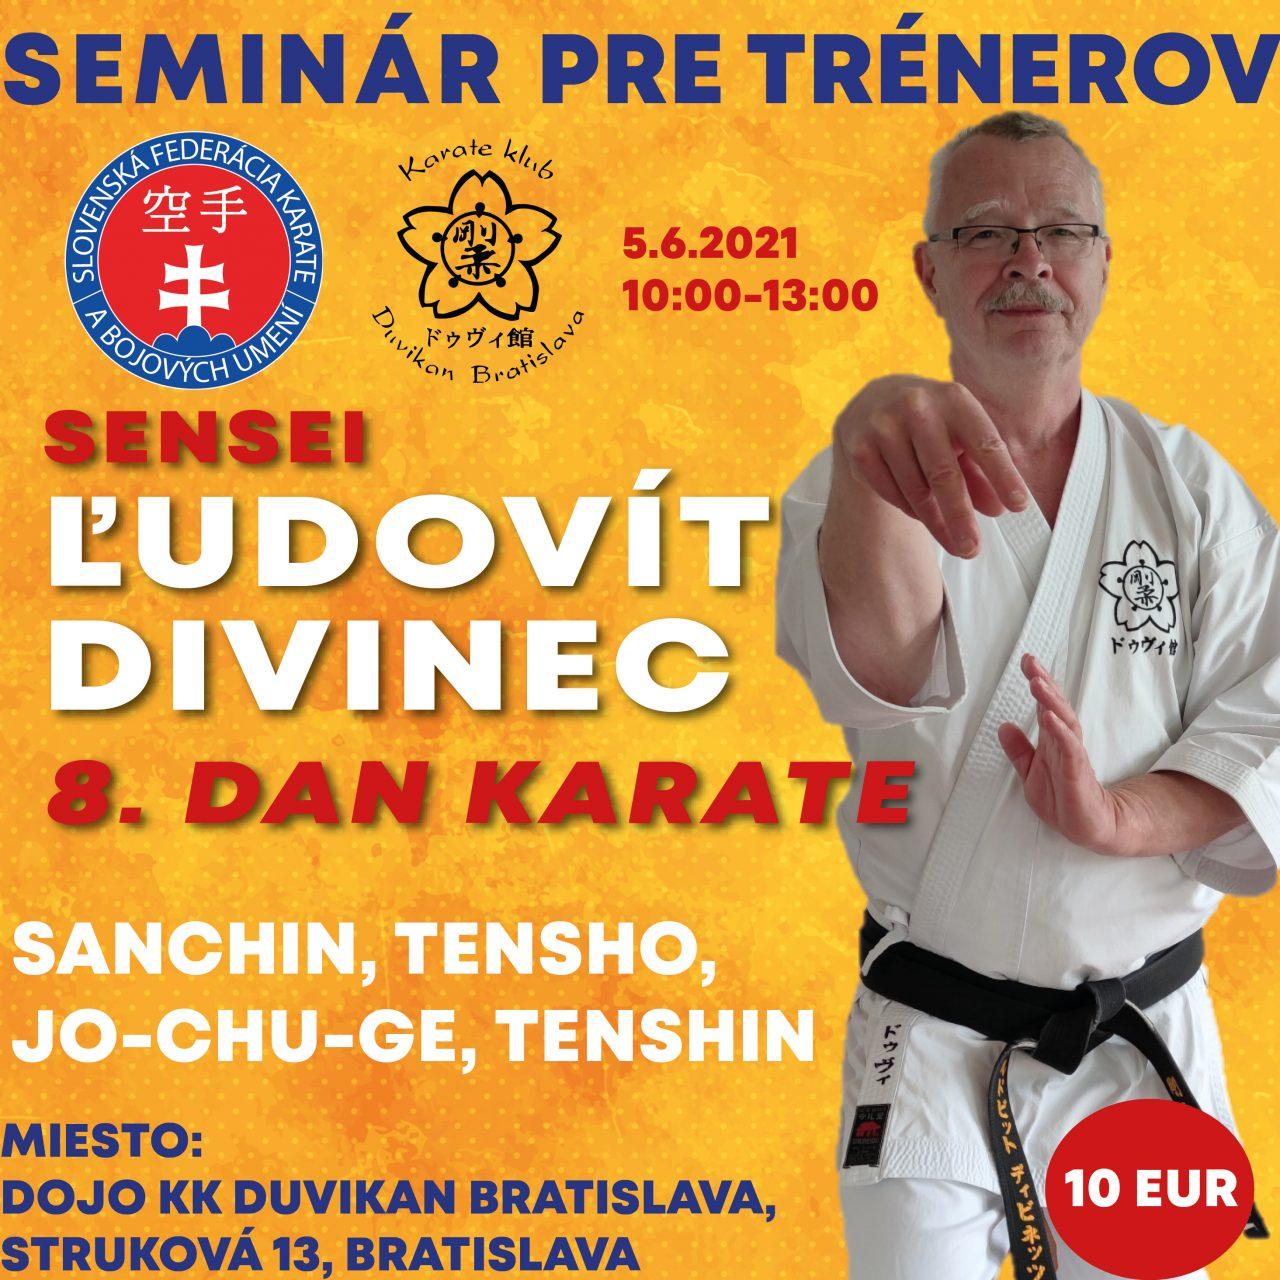 https://karate-slovakia.sk/wp-content/uploads/Divinec_seminar-1280x1280.jpg